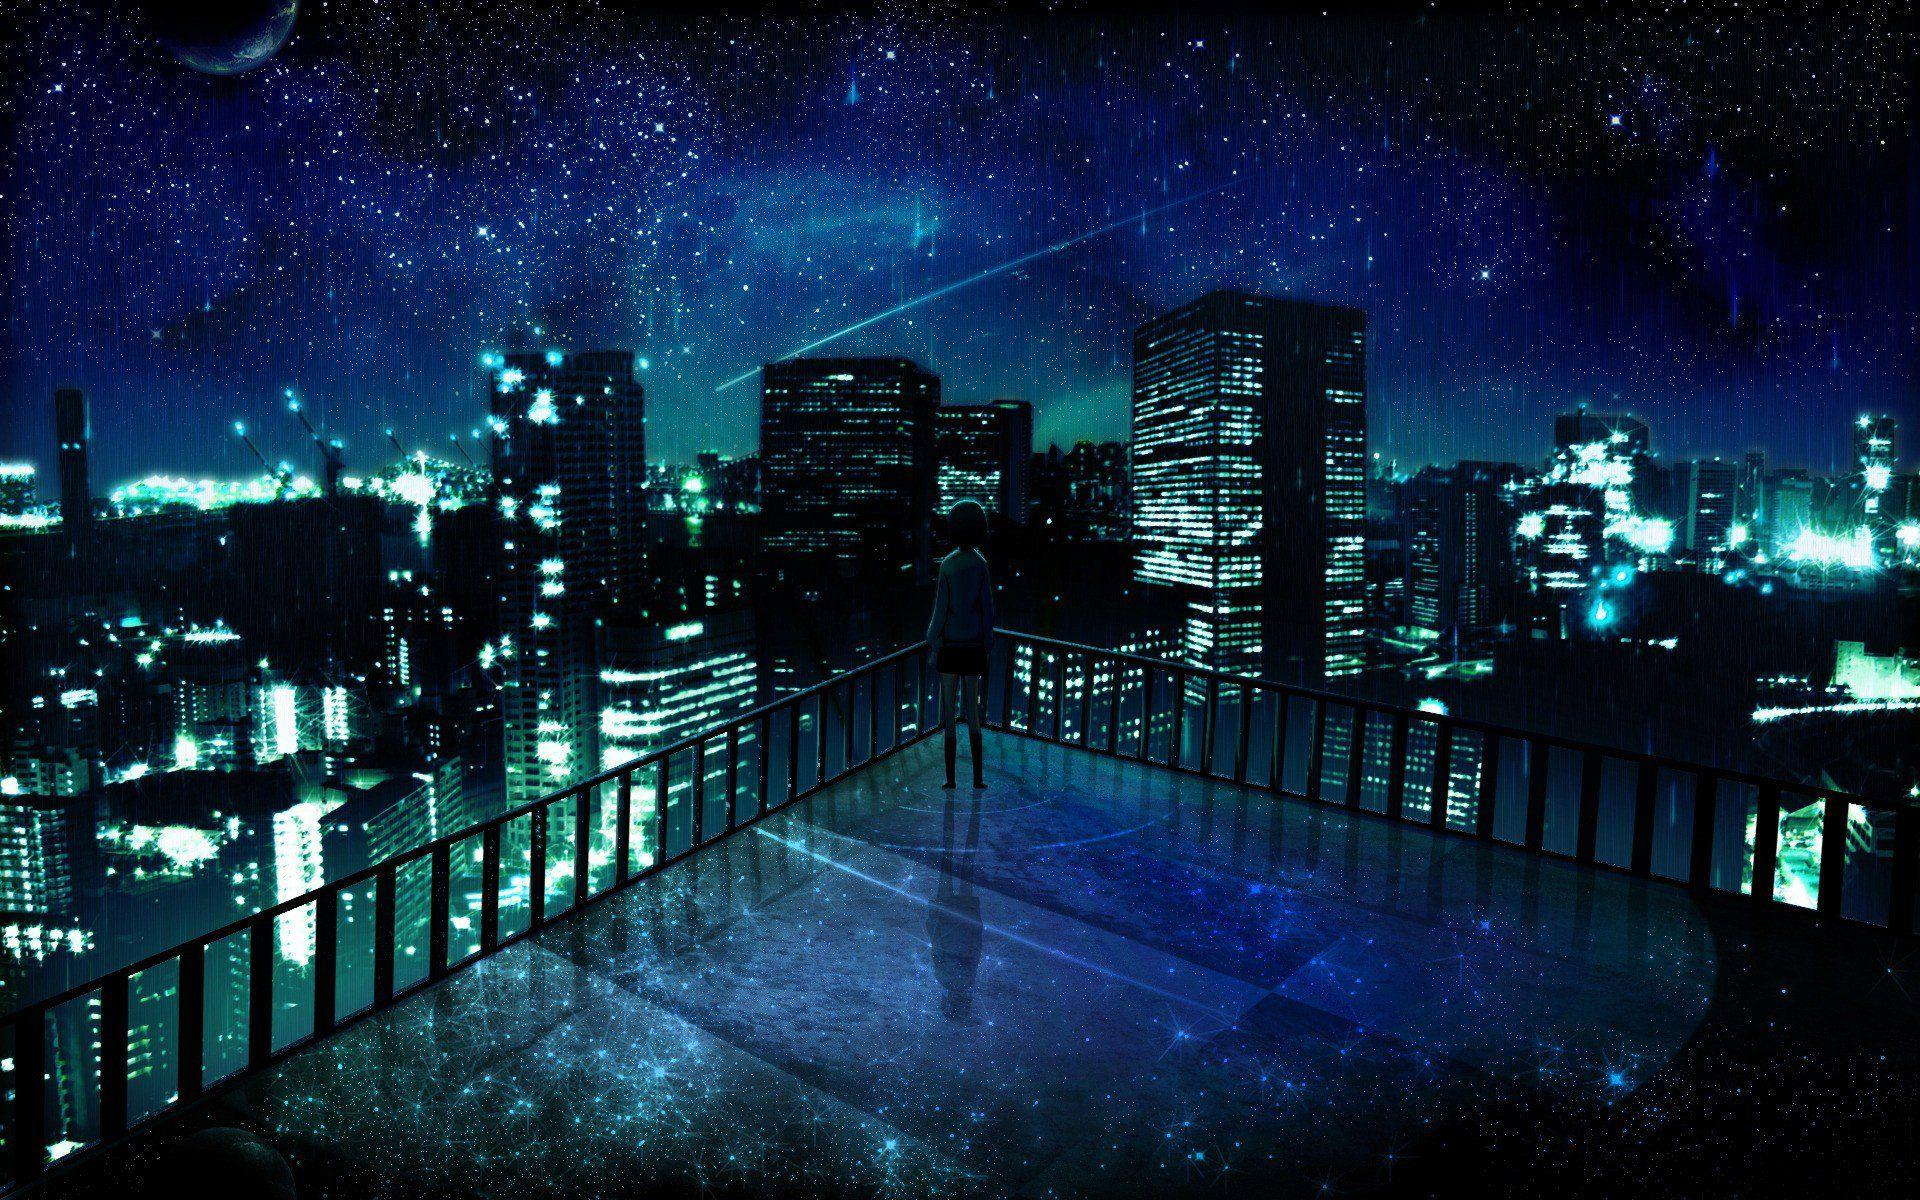 31+ Rainy Anime Iphone Wallpaper - Sachi Wallpaper